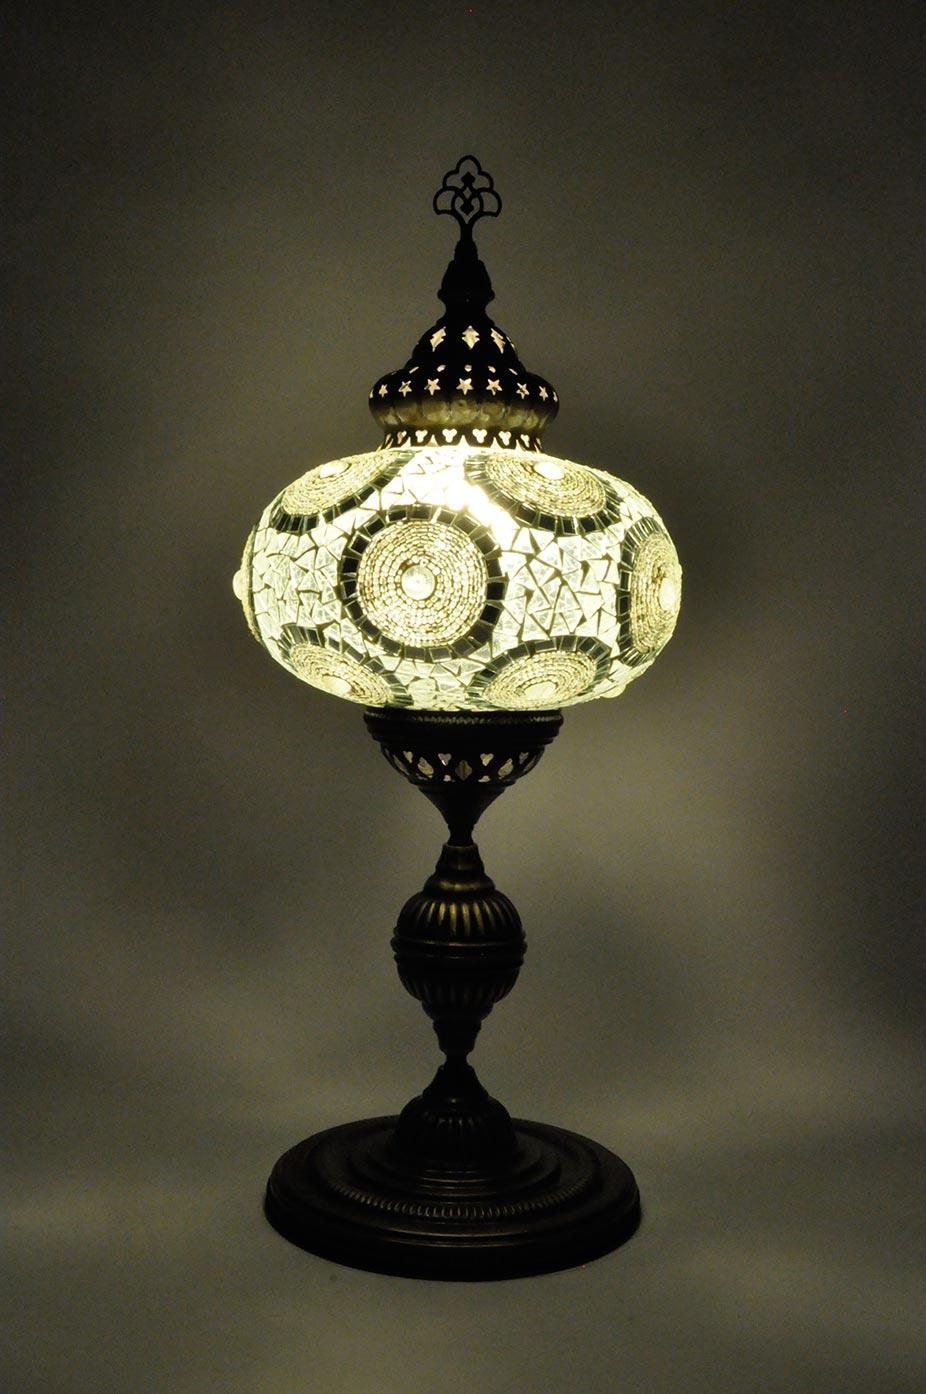 Lampe de table avec globe extra grand de mosaïque